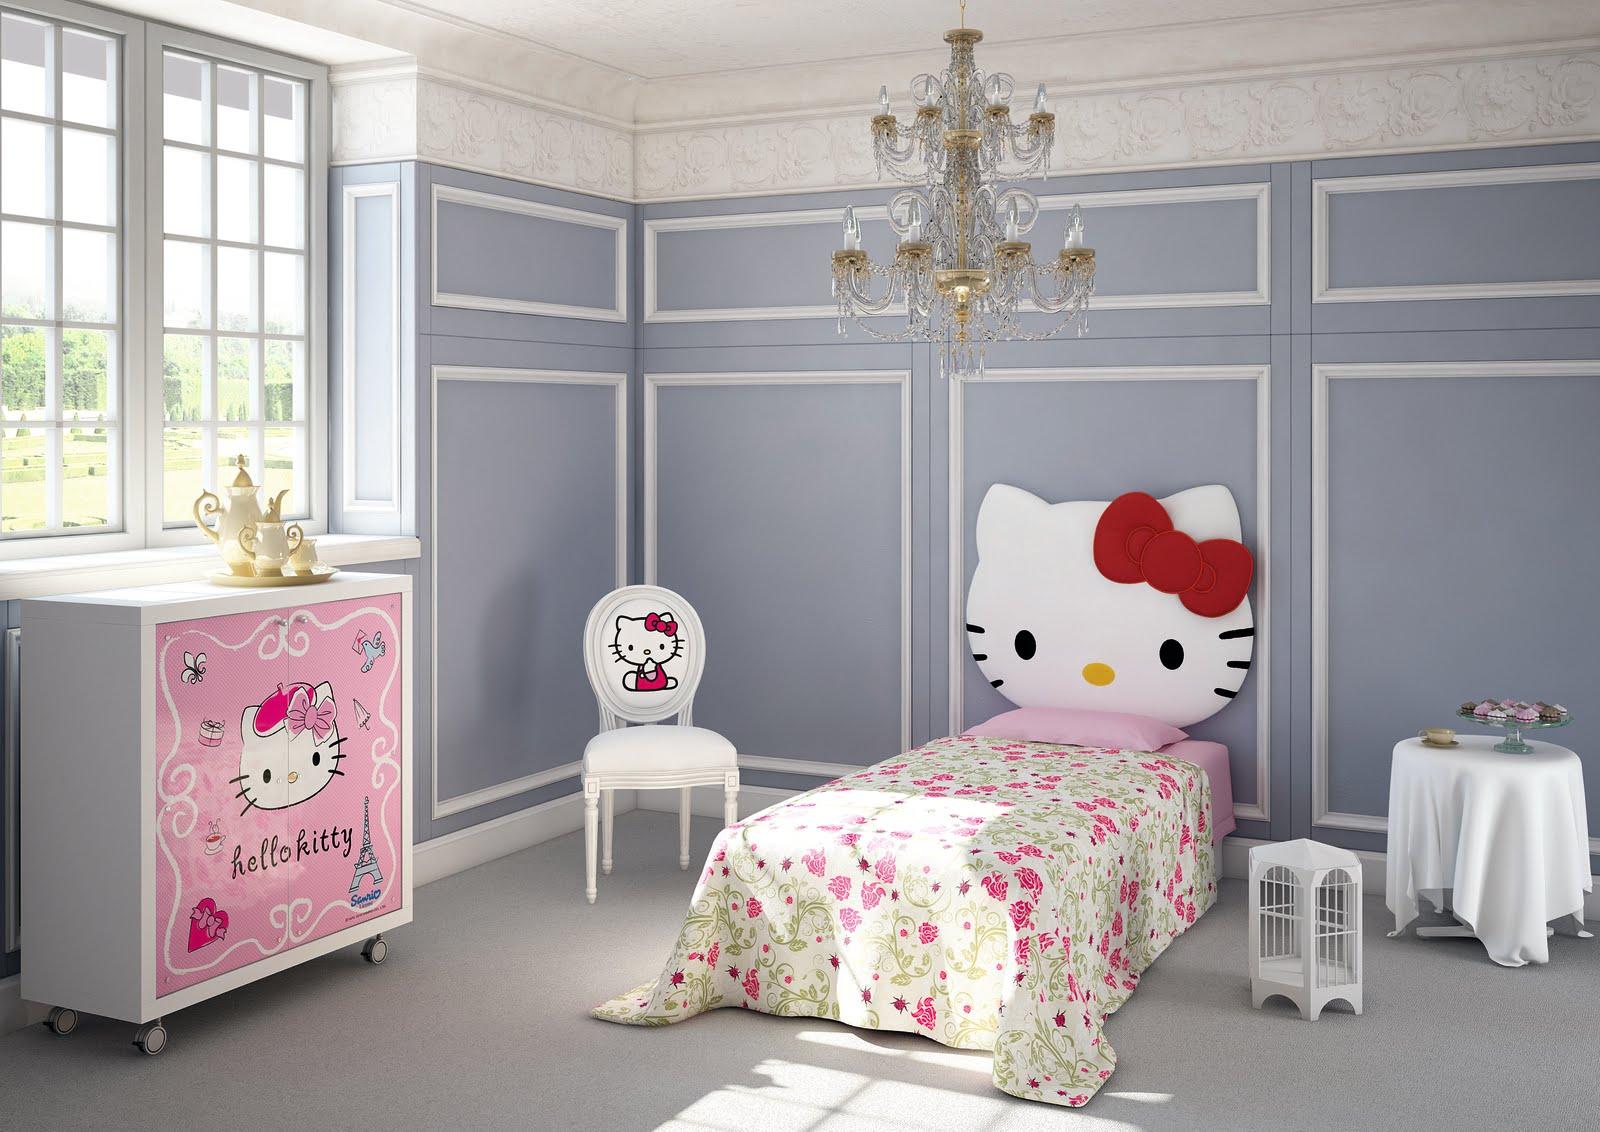 Gray Hello Kitty Bedroom - Room Decor and Design